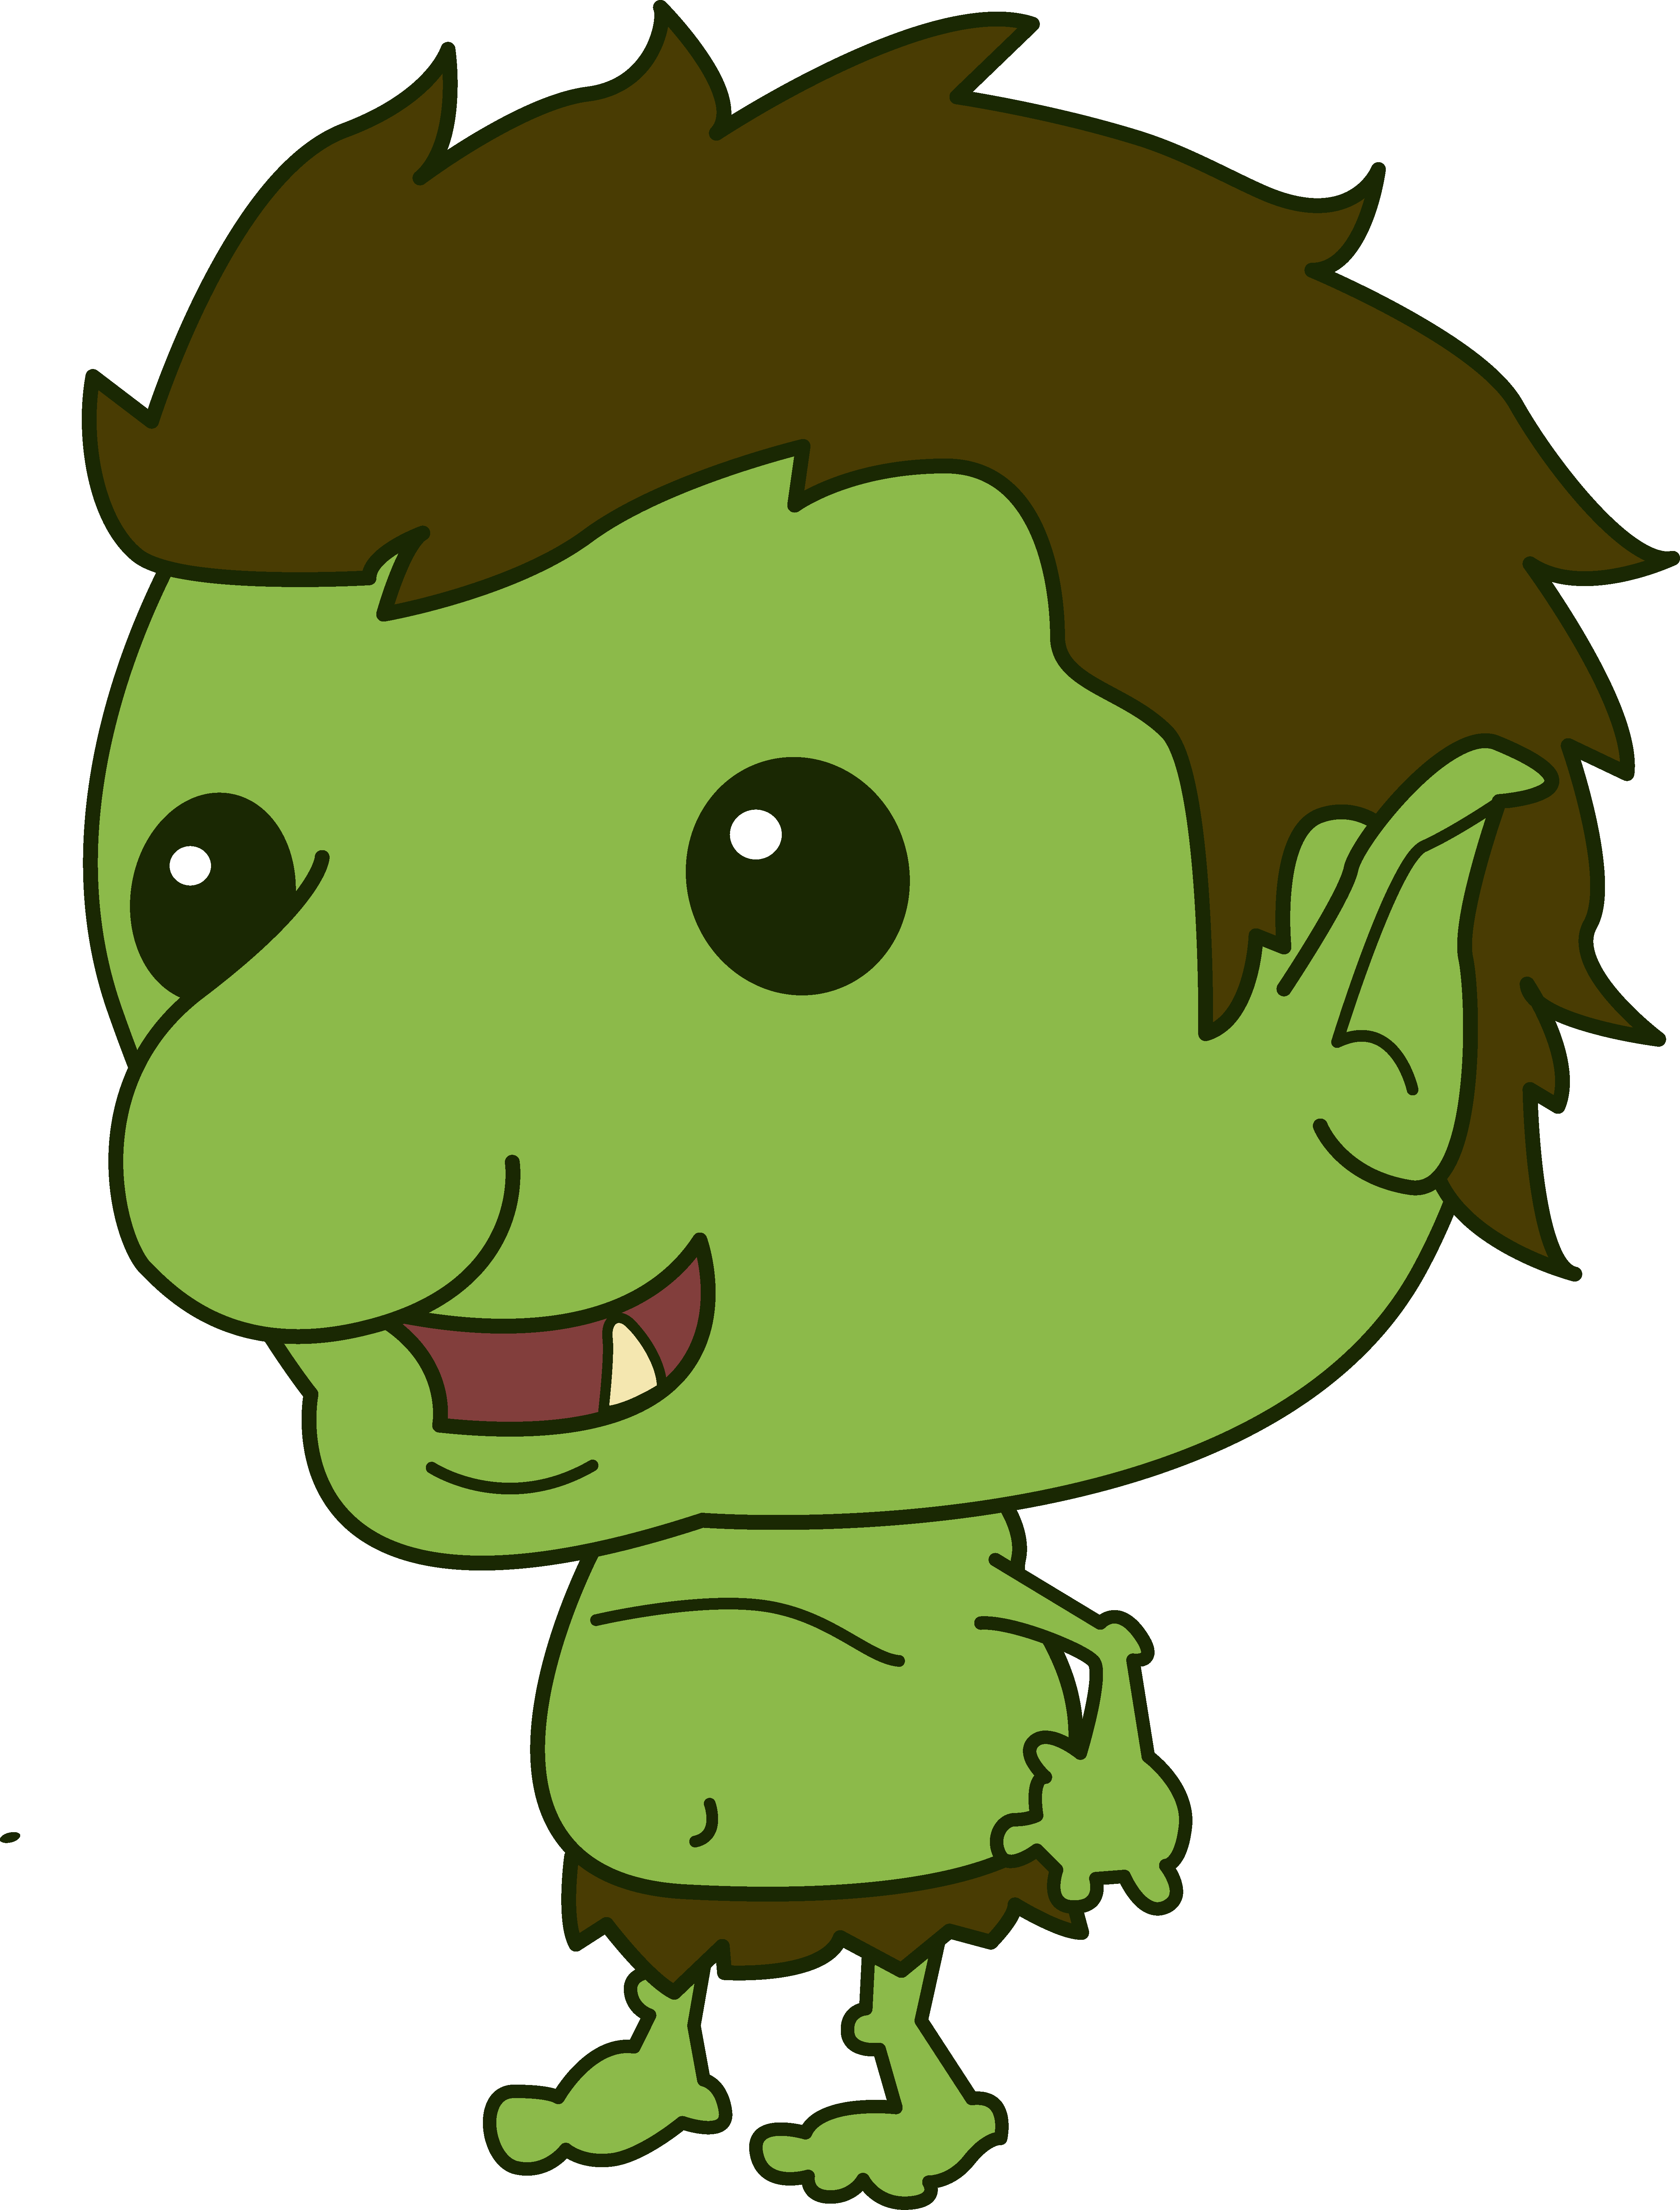 Free Troll Cliparts, Download Free Clip Art, Free Clip Art.